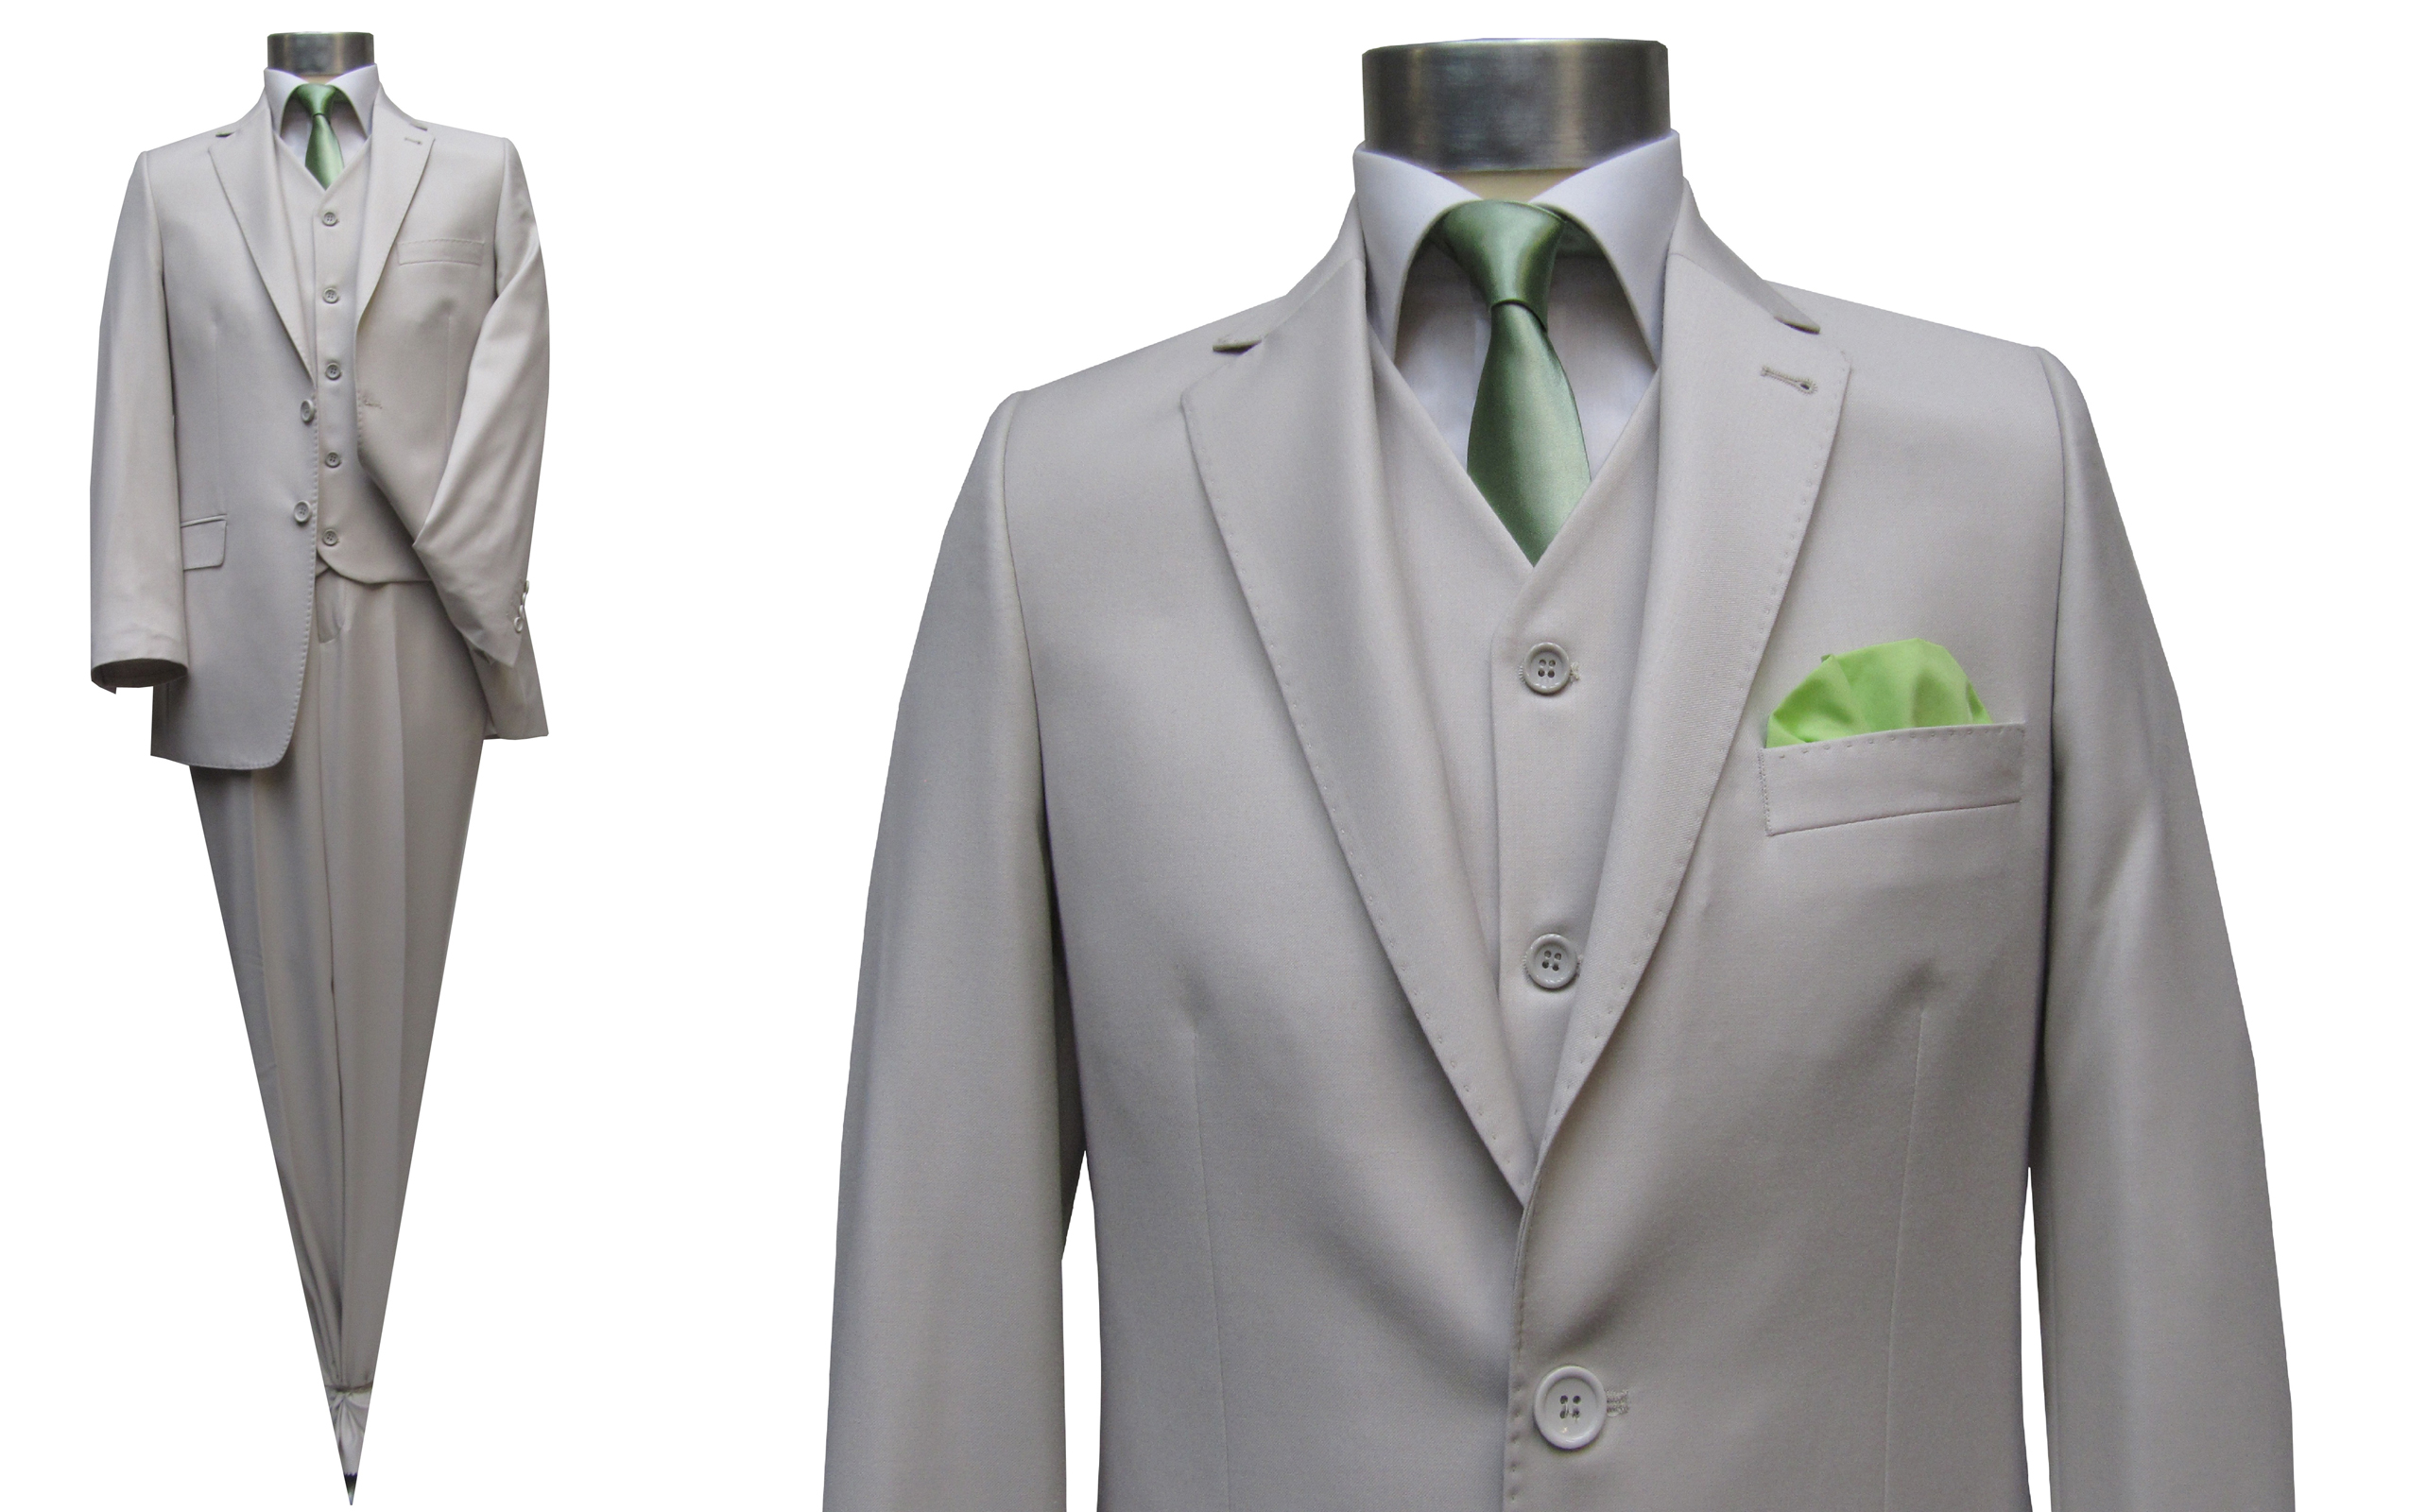 mmuga mens suit creambeige muga clothing suit. Black Bedroom Furniture Sets. Home Design Ideas